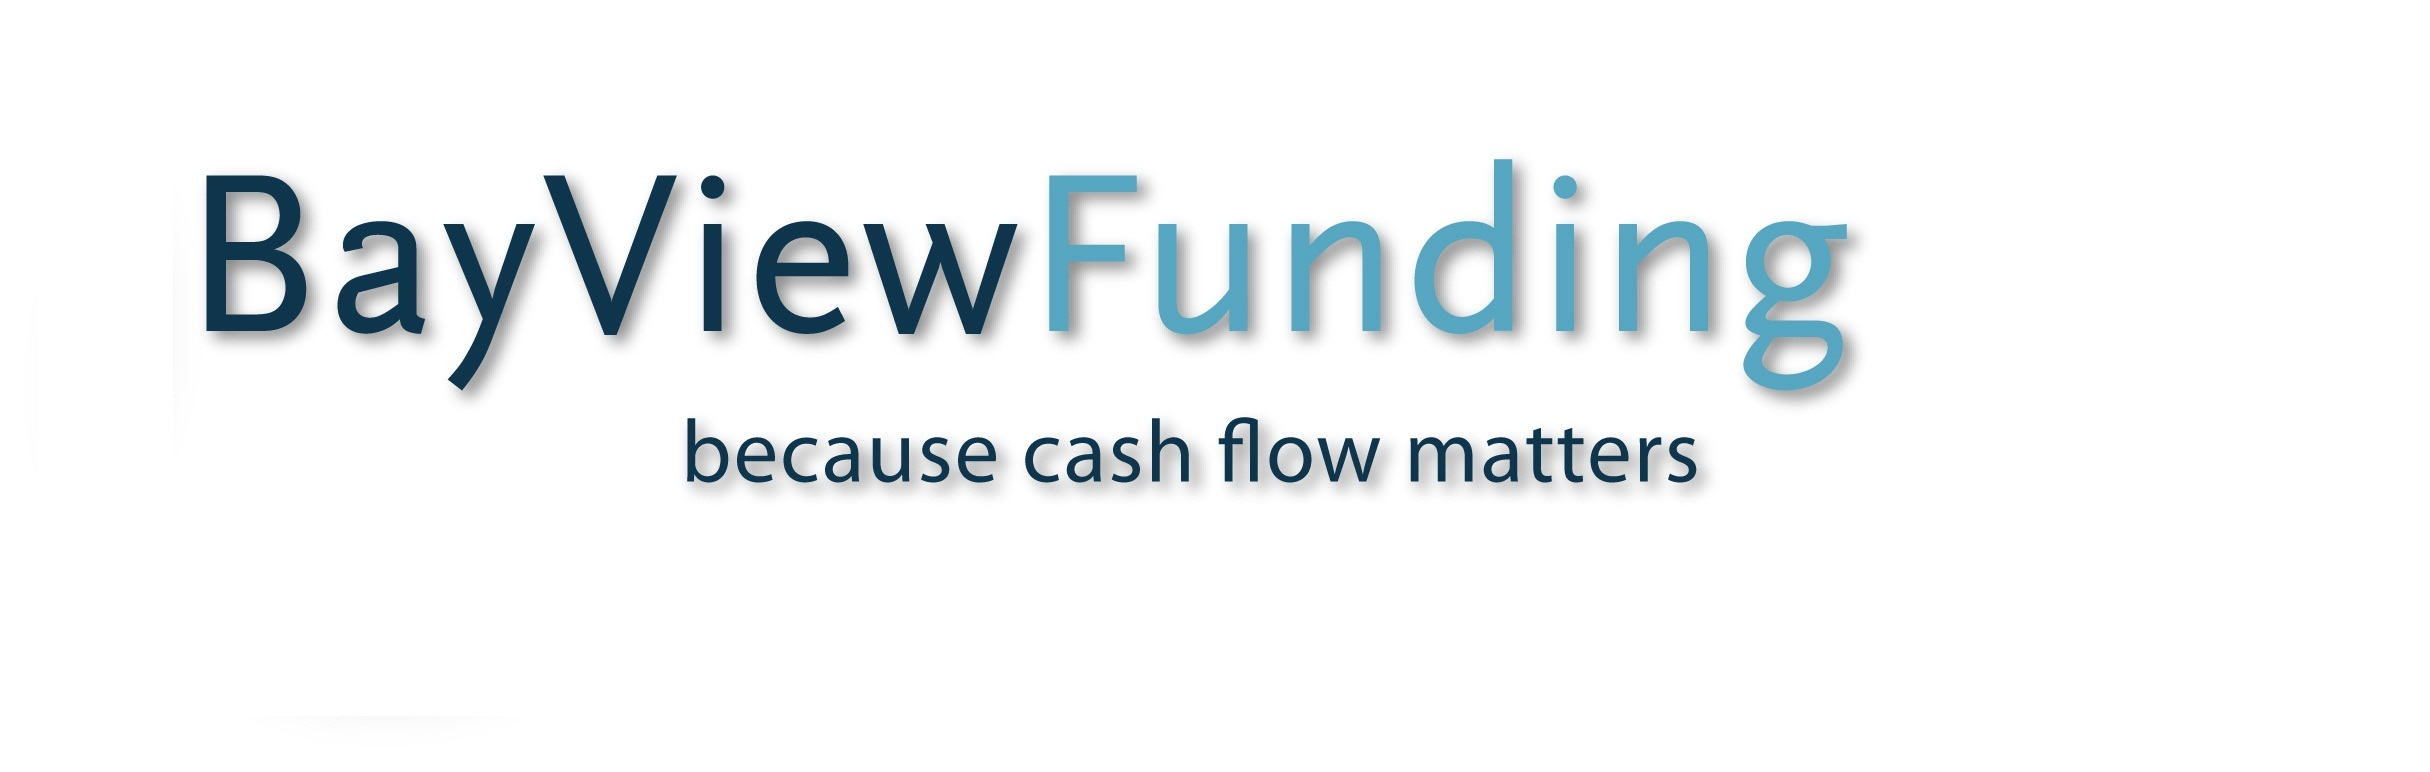 Bay View Funding